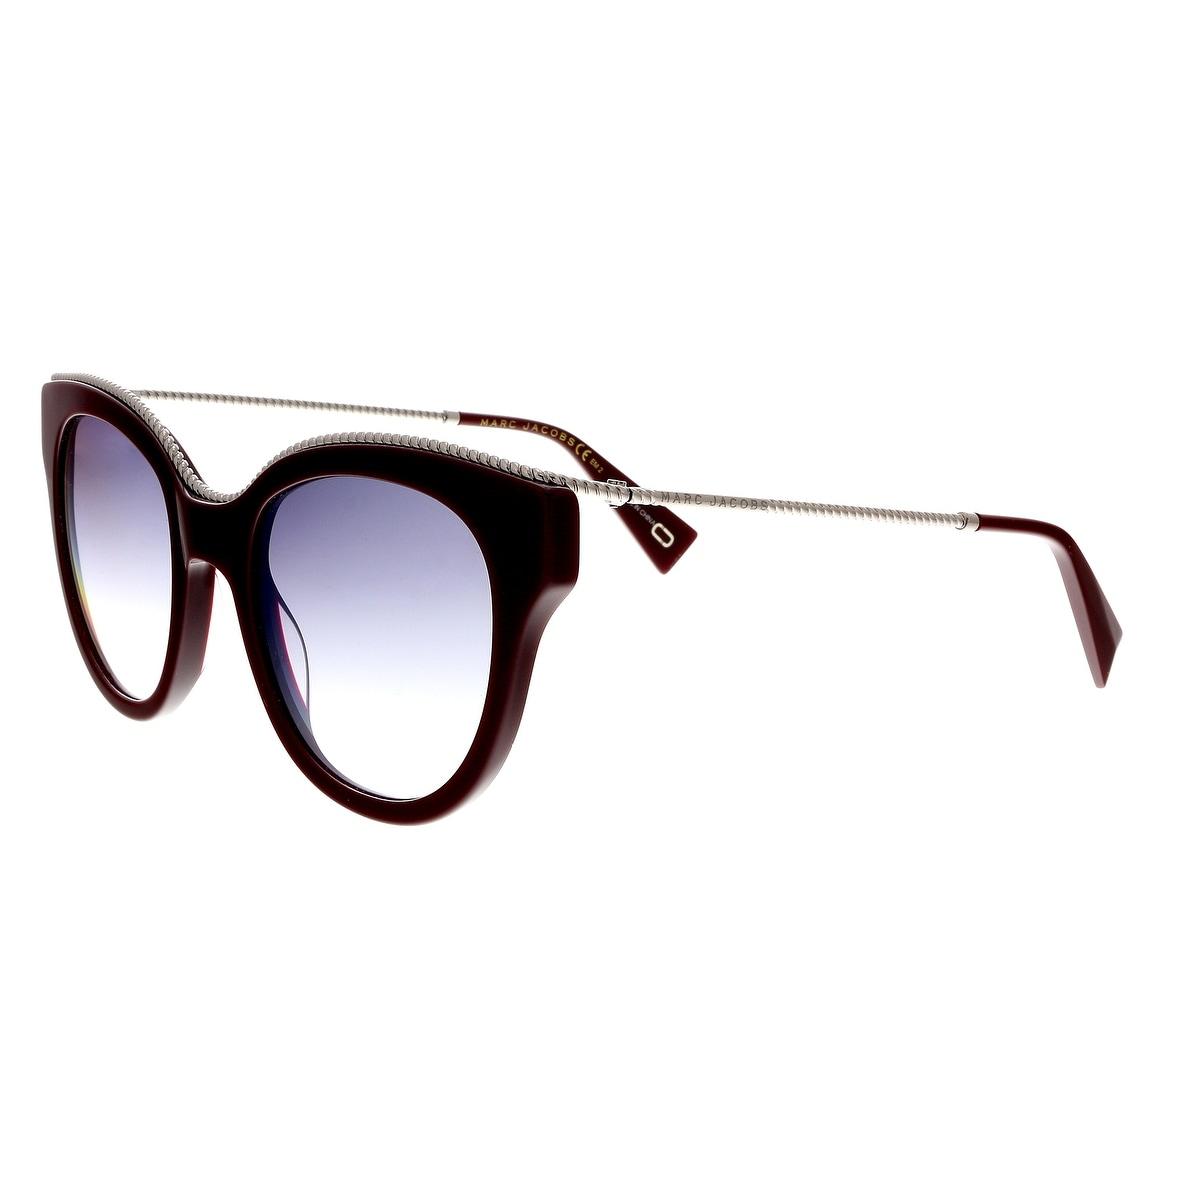 14c47b0760af Marc Jacobs Sunglasses | Shop our Best Clothing & Shoes Deals Online at  Overstock